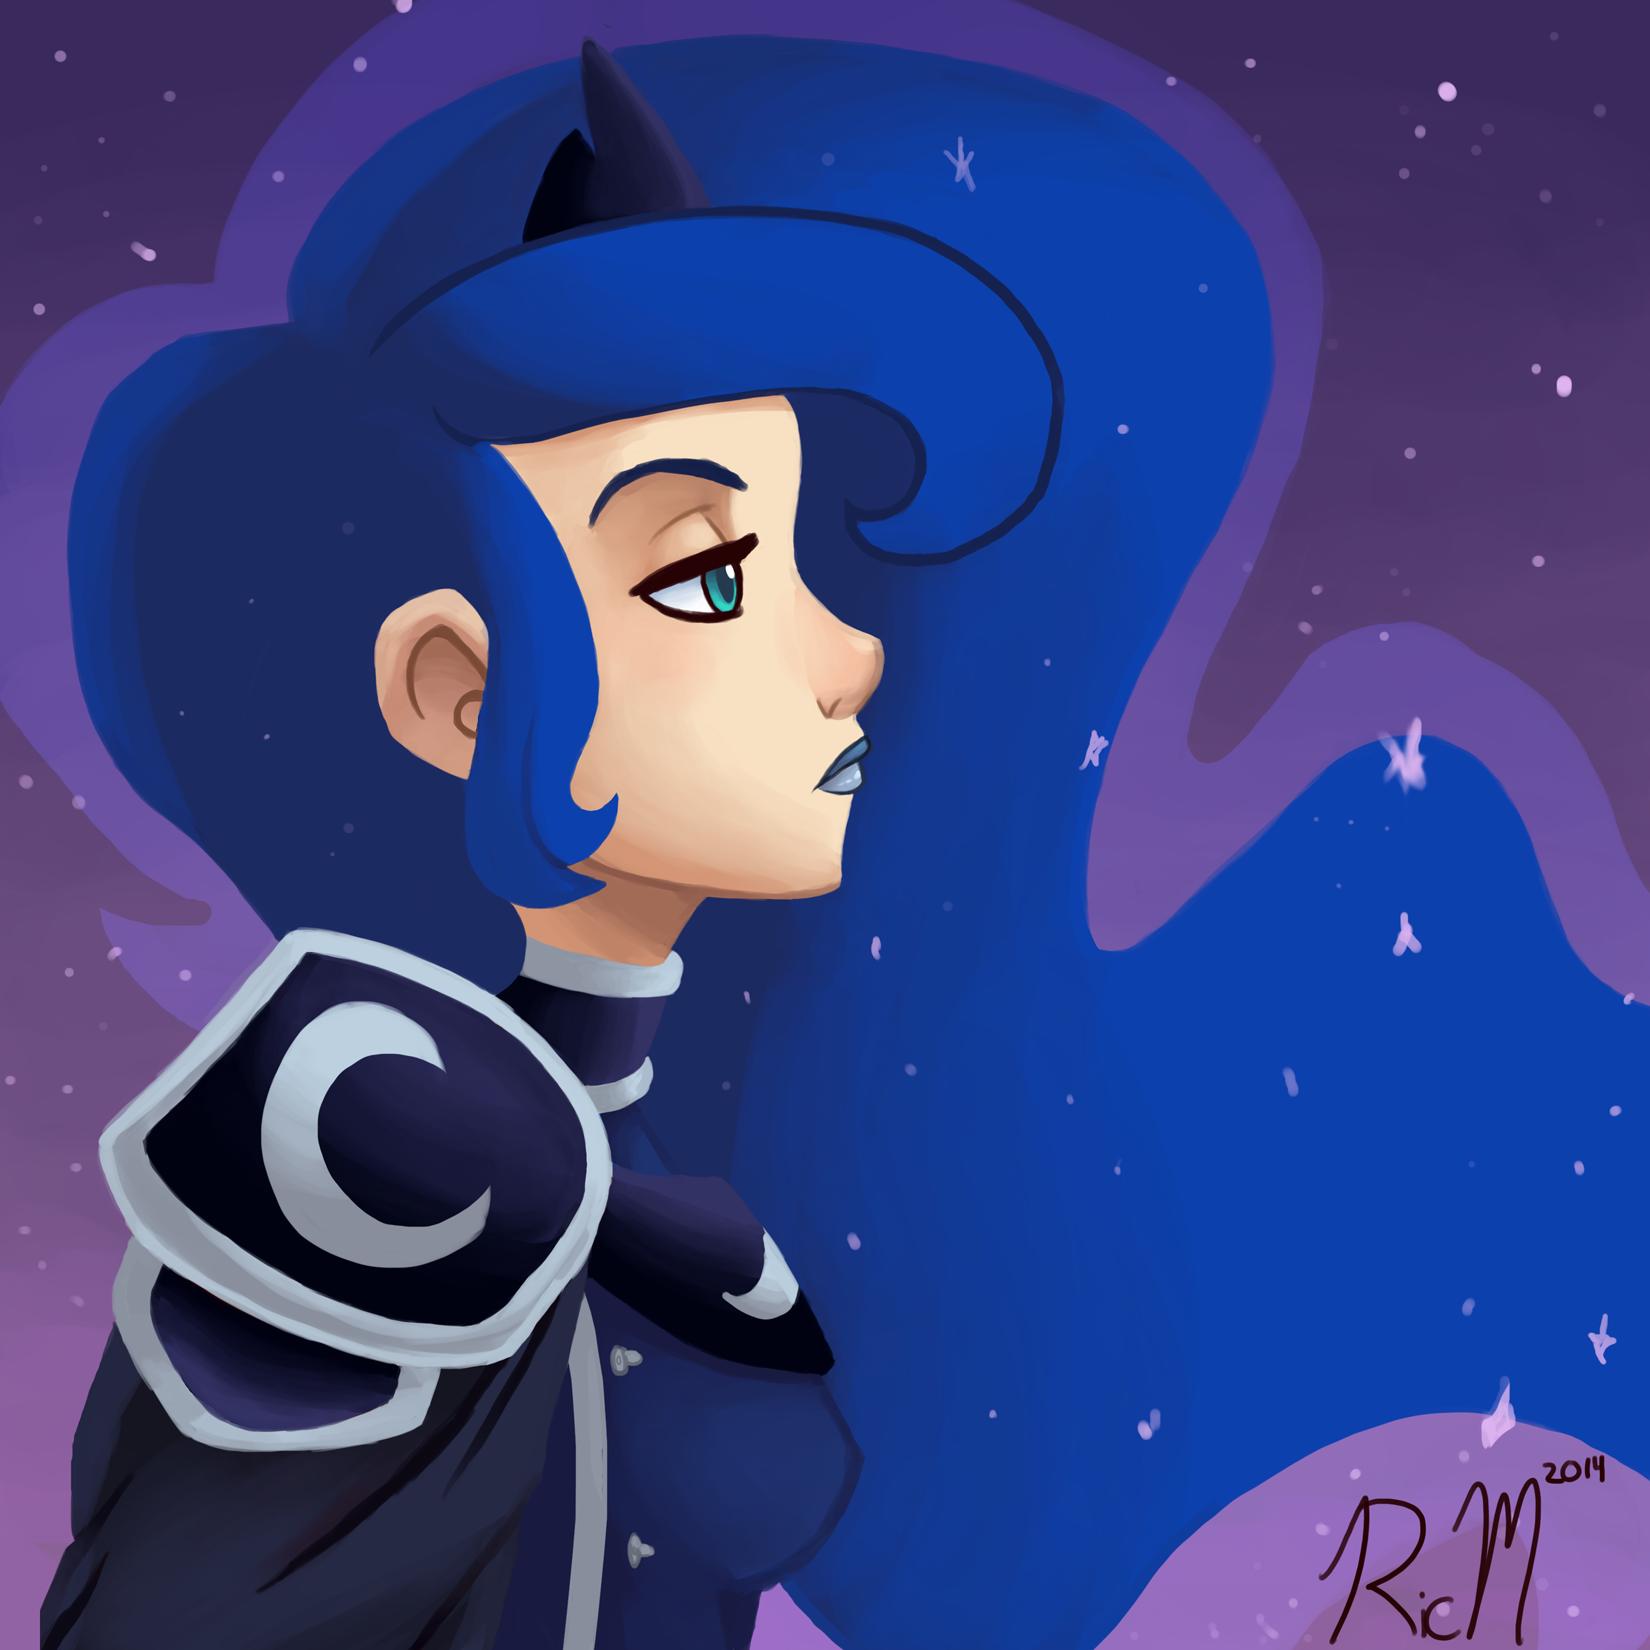 Princess Luna by Ric-M on DeviantArt